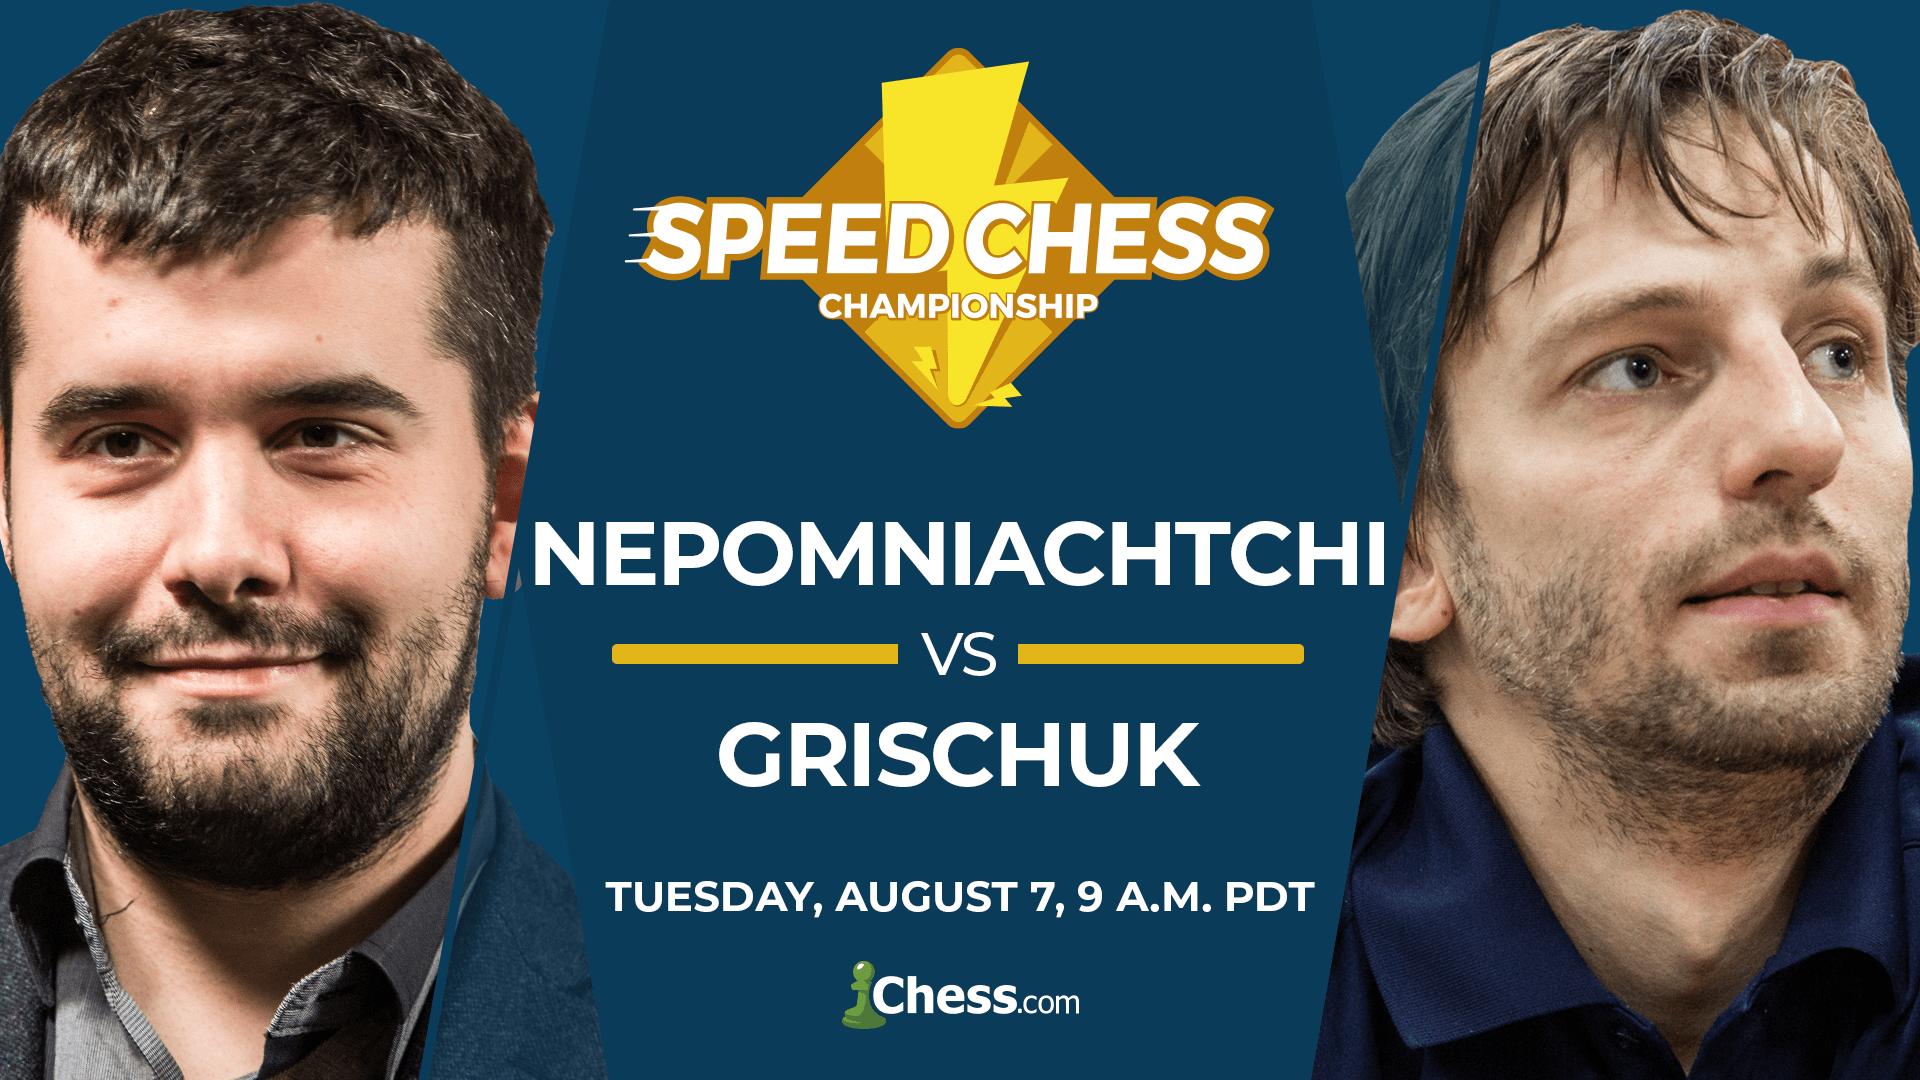 Nepomniachtchi vsGrischuk:Tuesday, August 7, 9 a.m. PDT